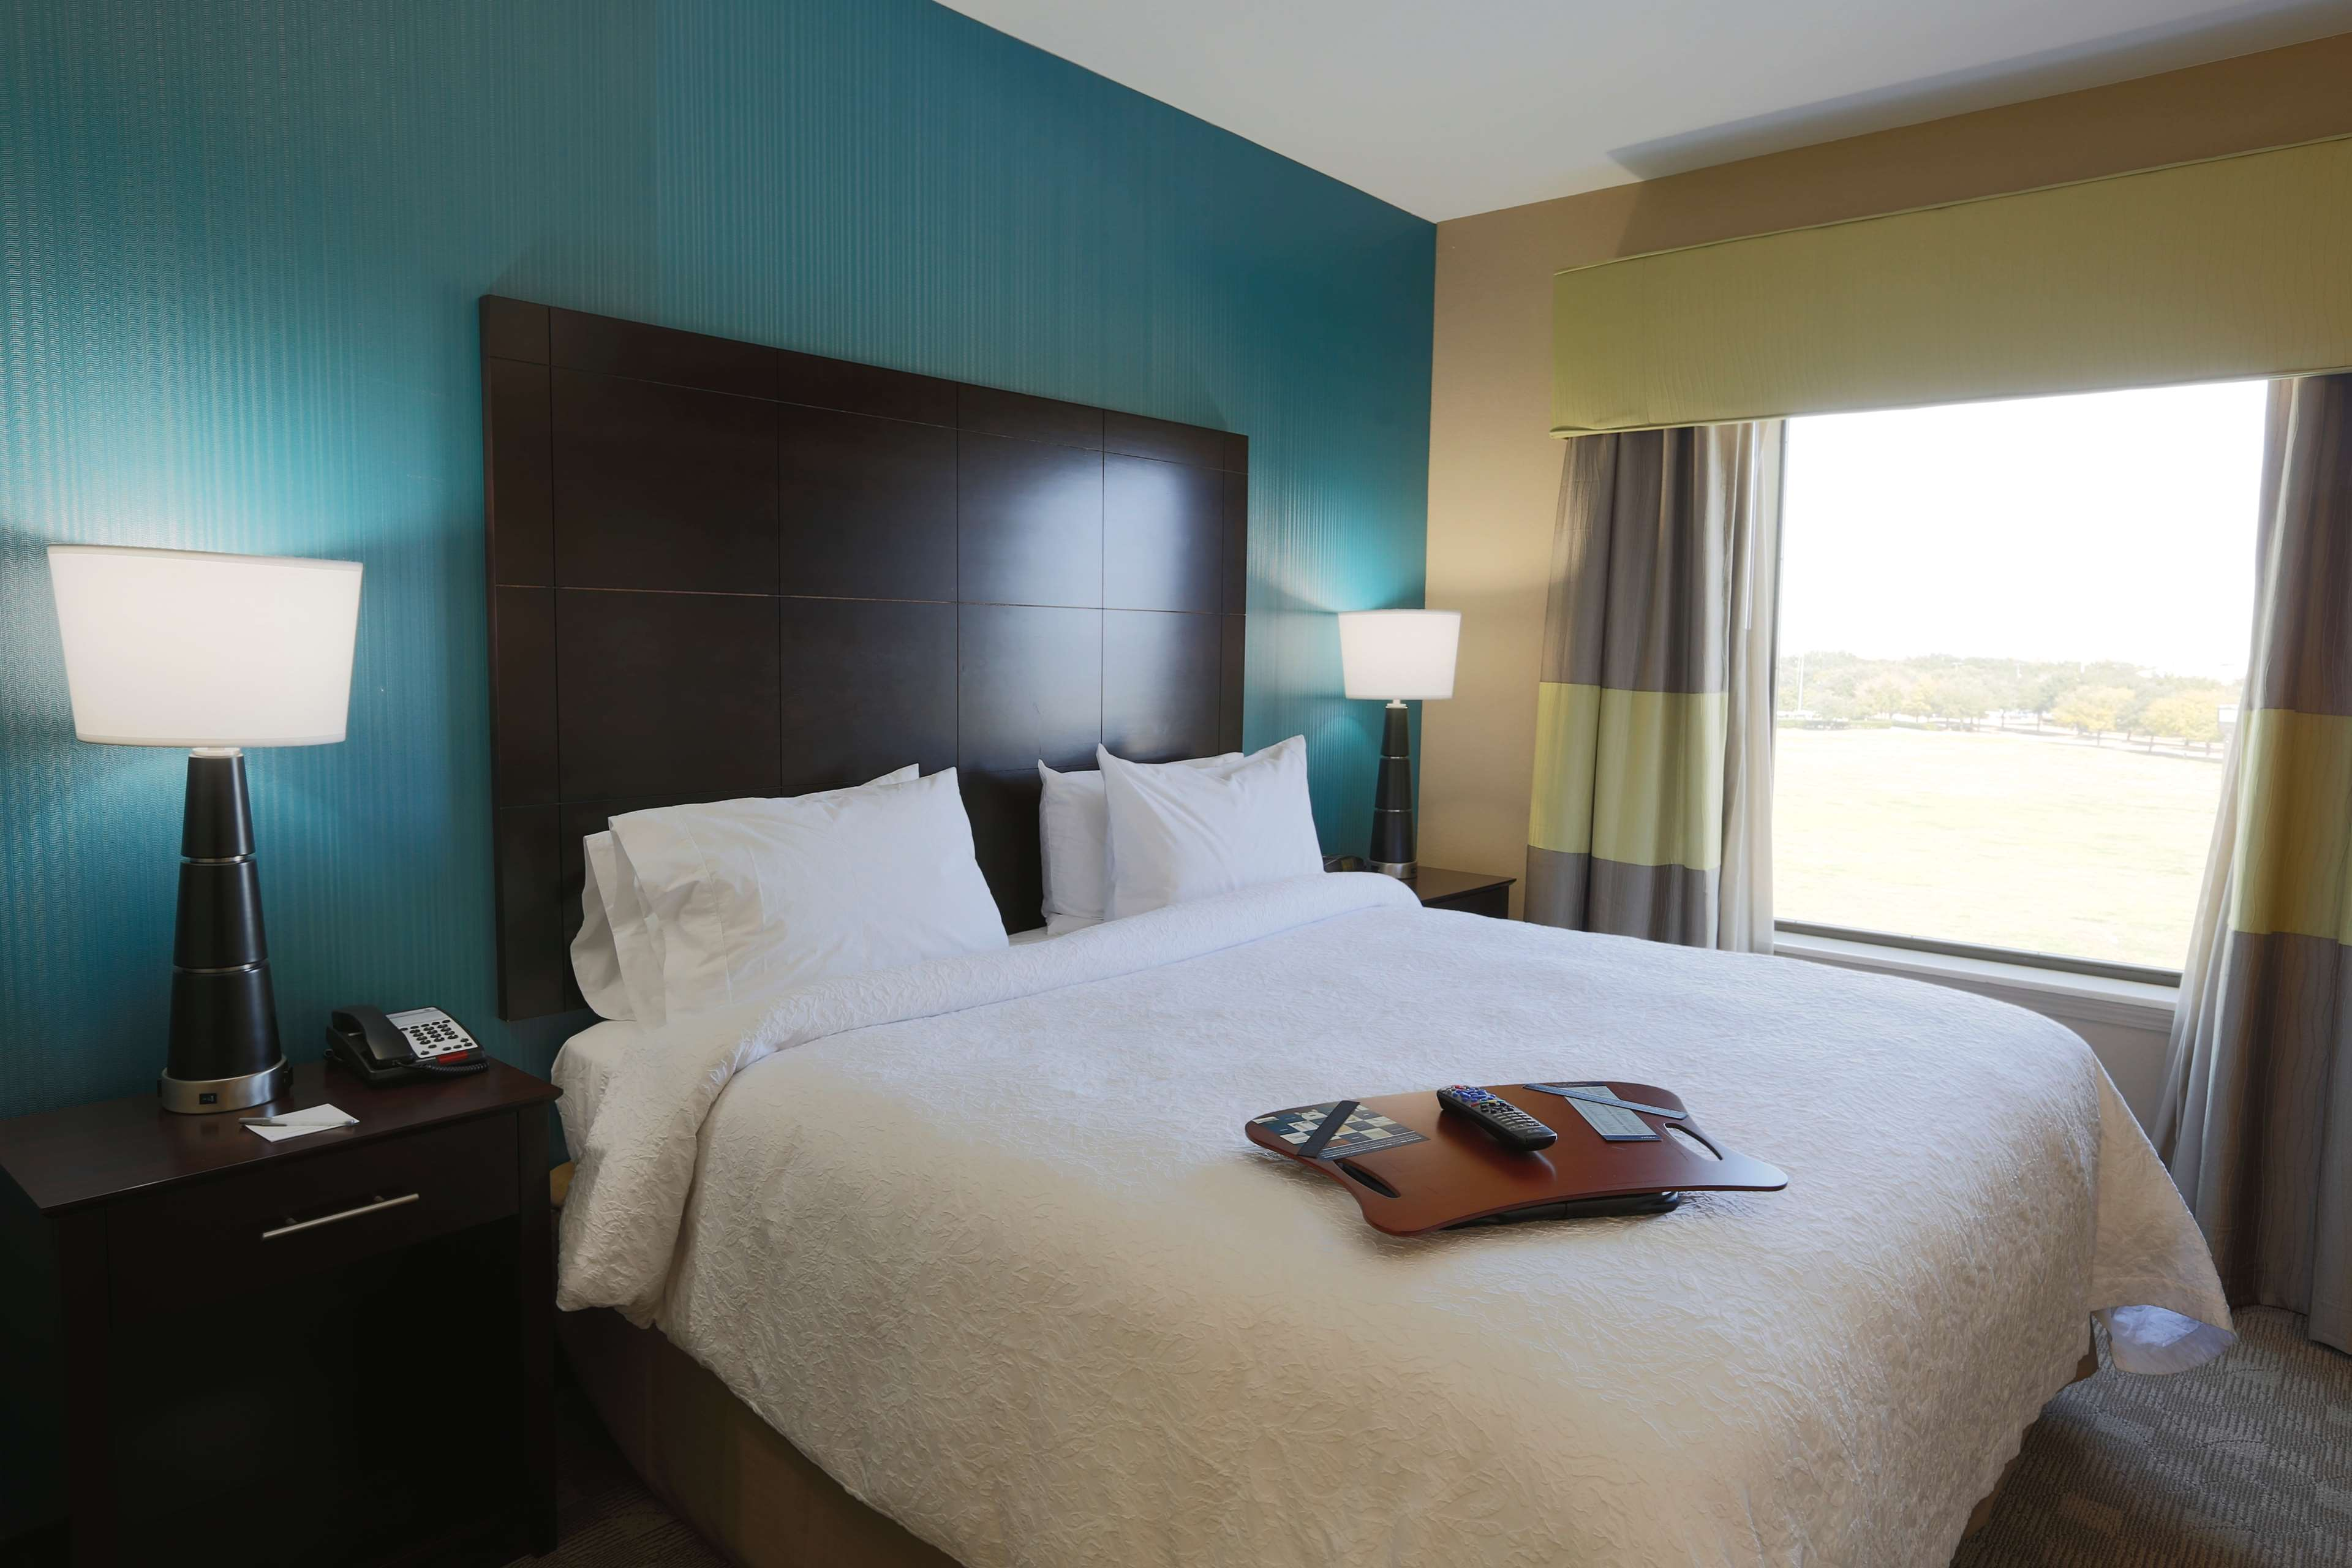 Hampton Inn & Suites Missouri City, TX image 28